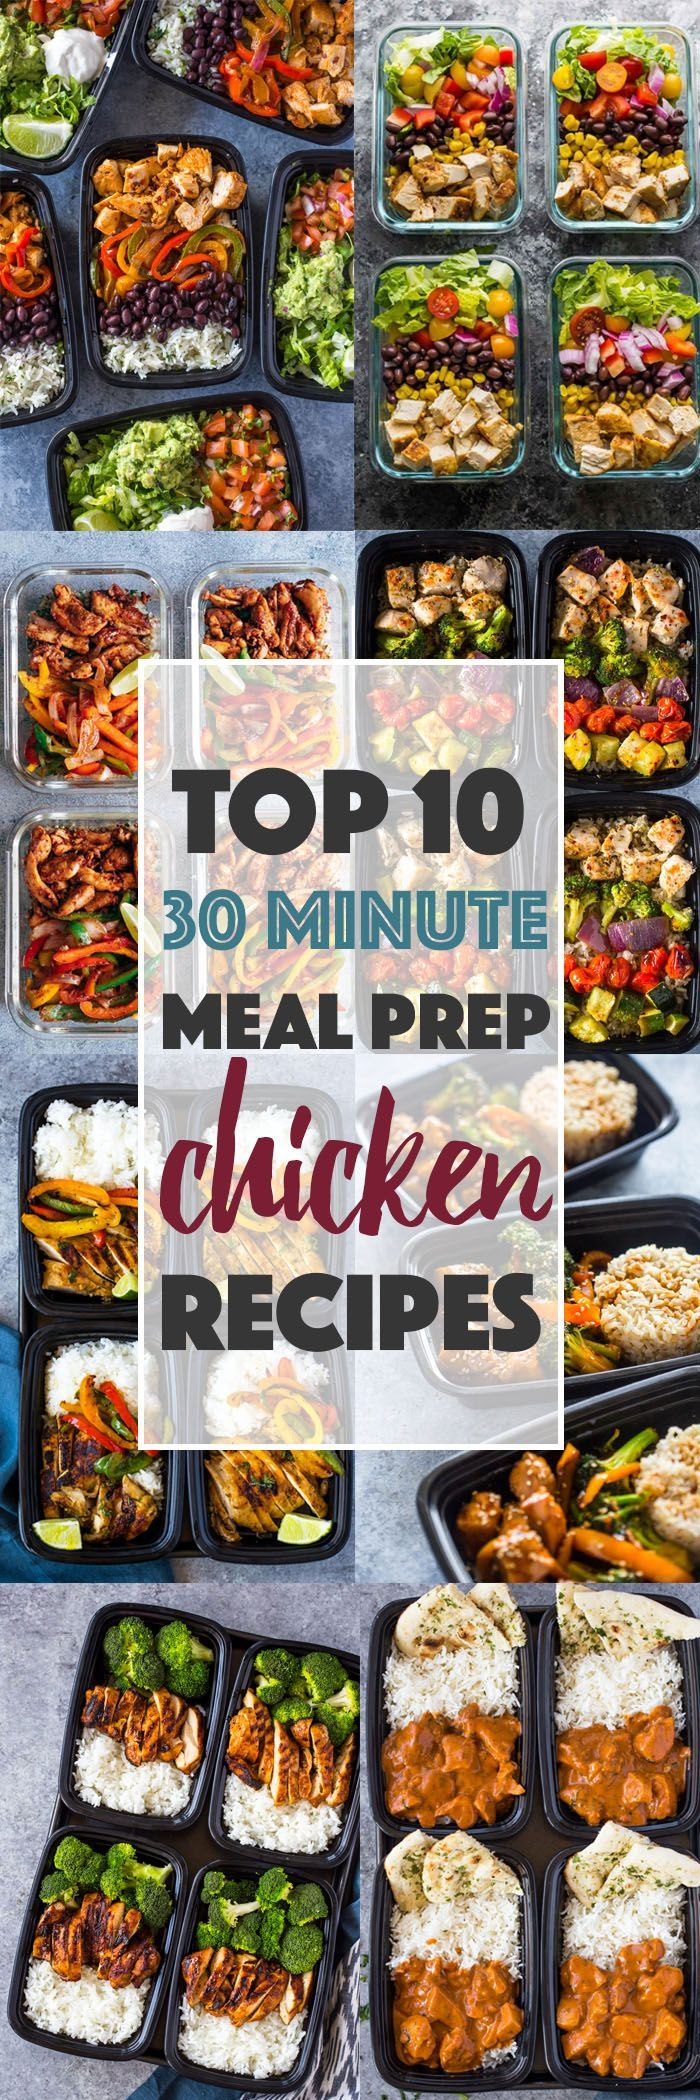 Top 10 (30 Minute) Meal-prep Chicken Recipes #healthy #mealprep #recipes #top #b…